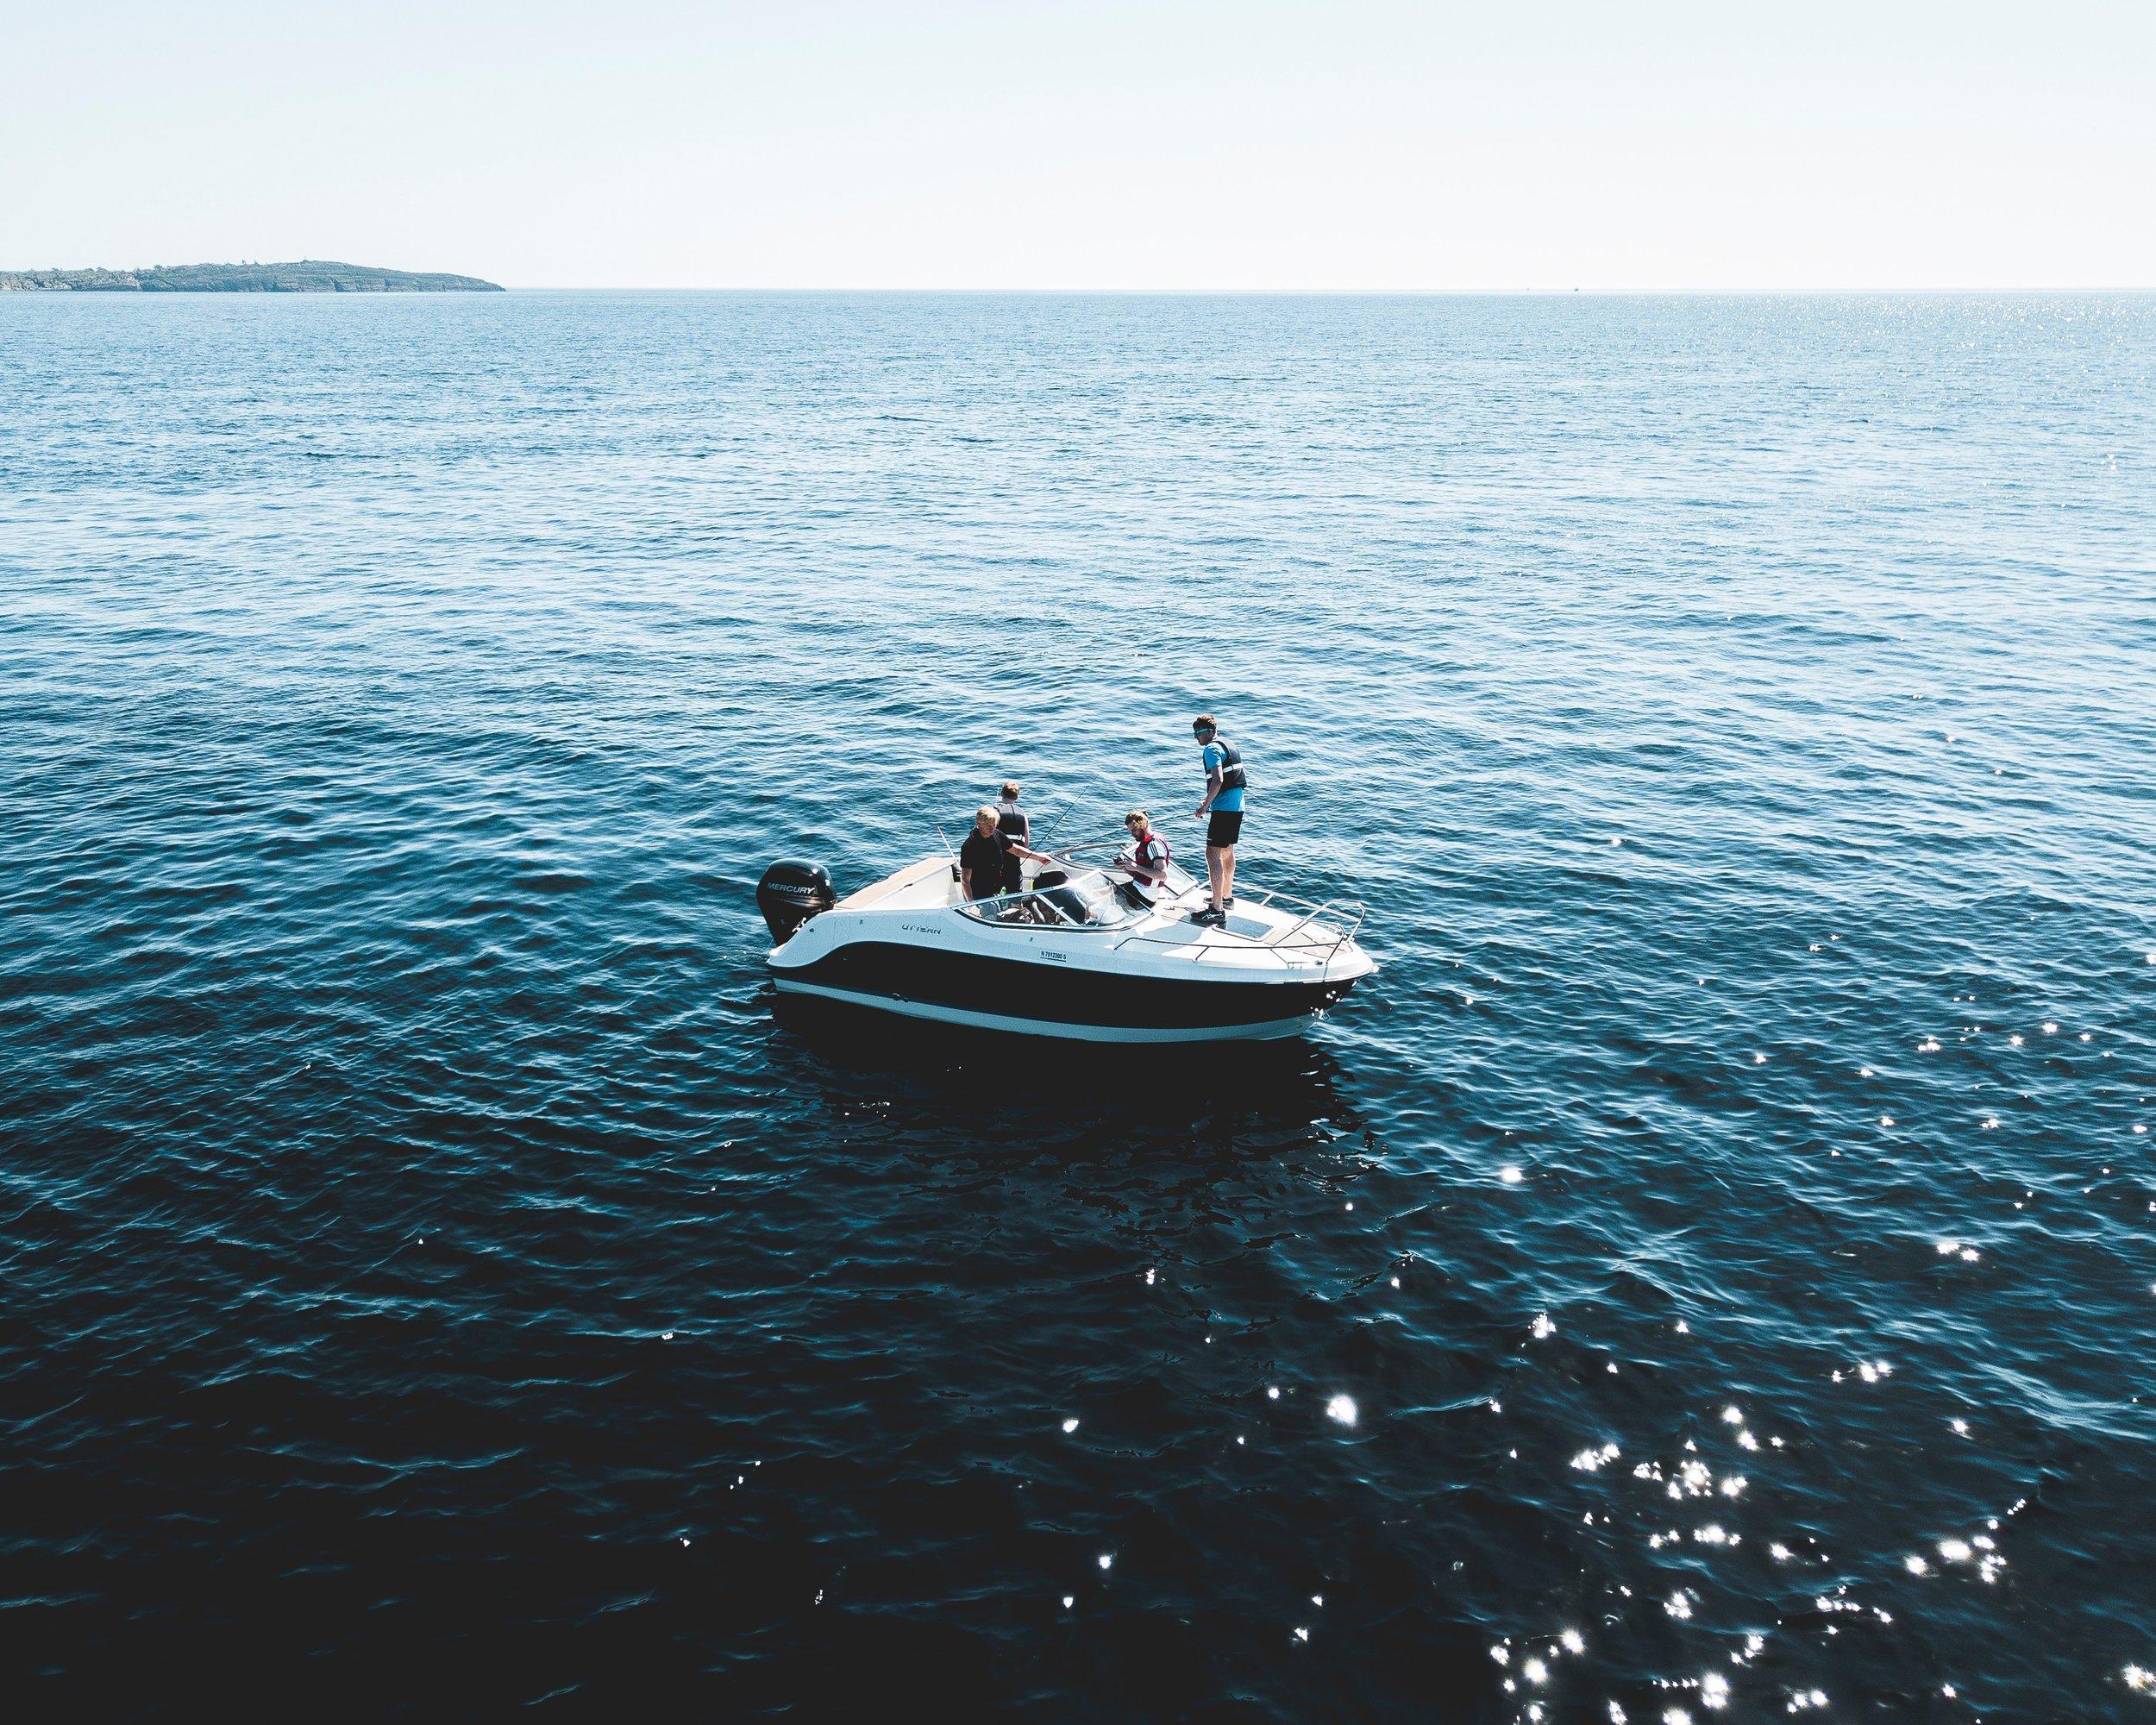 adventure-boat-daylight-1106423.jpg